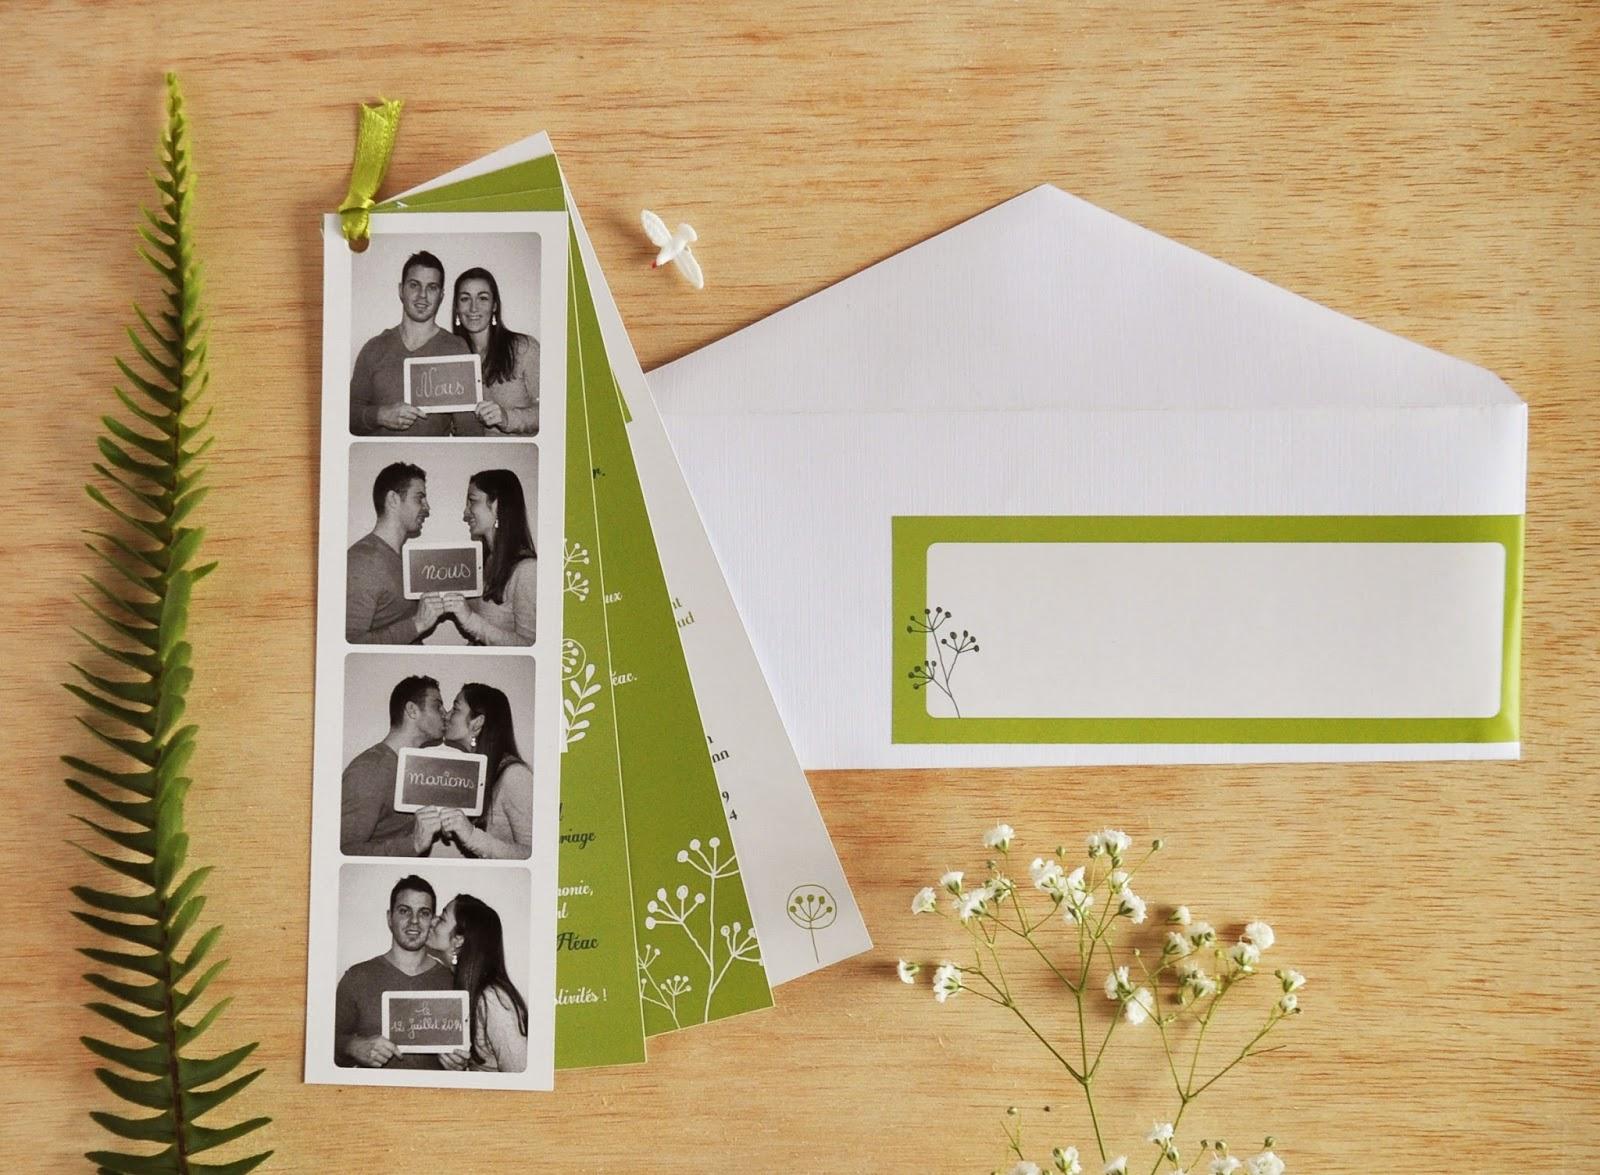 mariage mathilde loic vgtal doux et fleuri faire part de mariage photomaton - Faire Part Photomaton Mariage